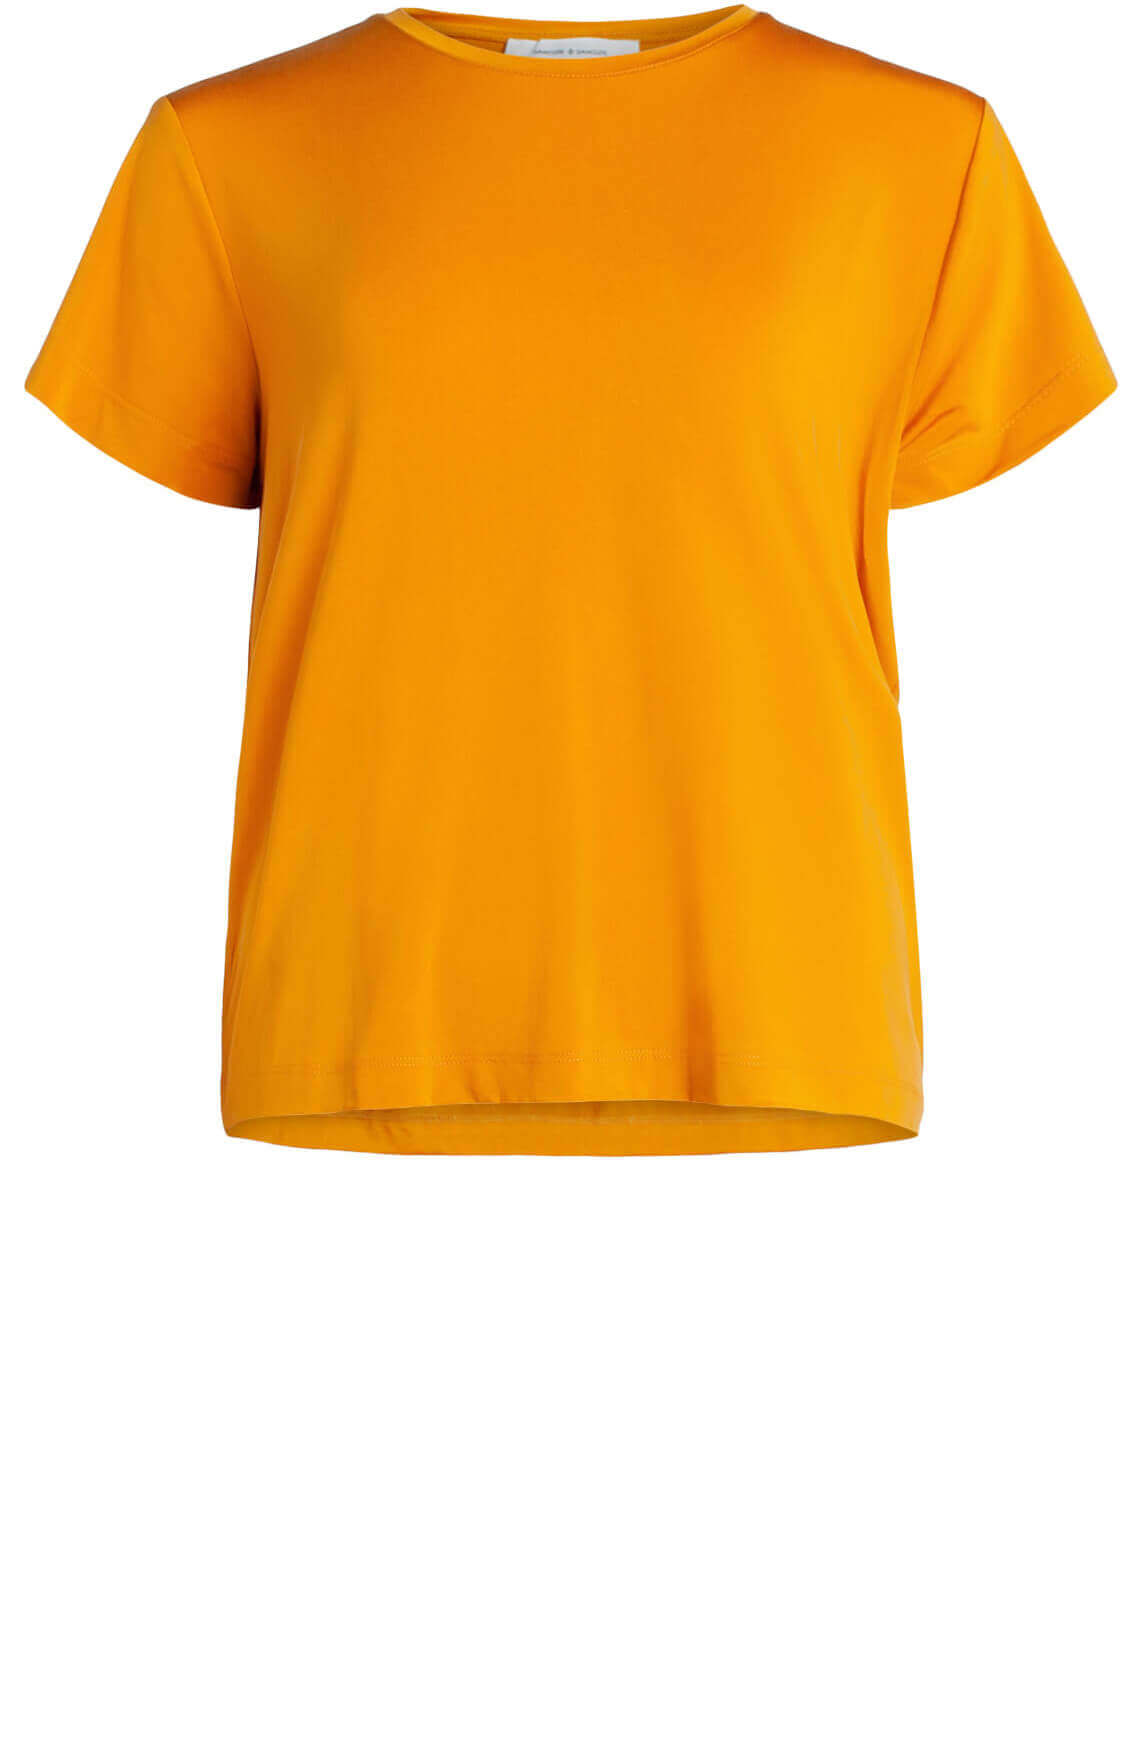 Samsoe Samsoe Dames Siff cupro shirt geel